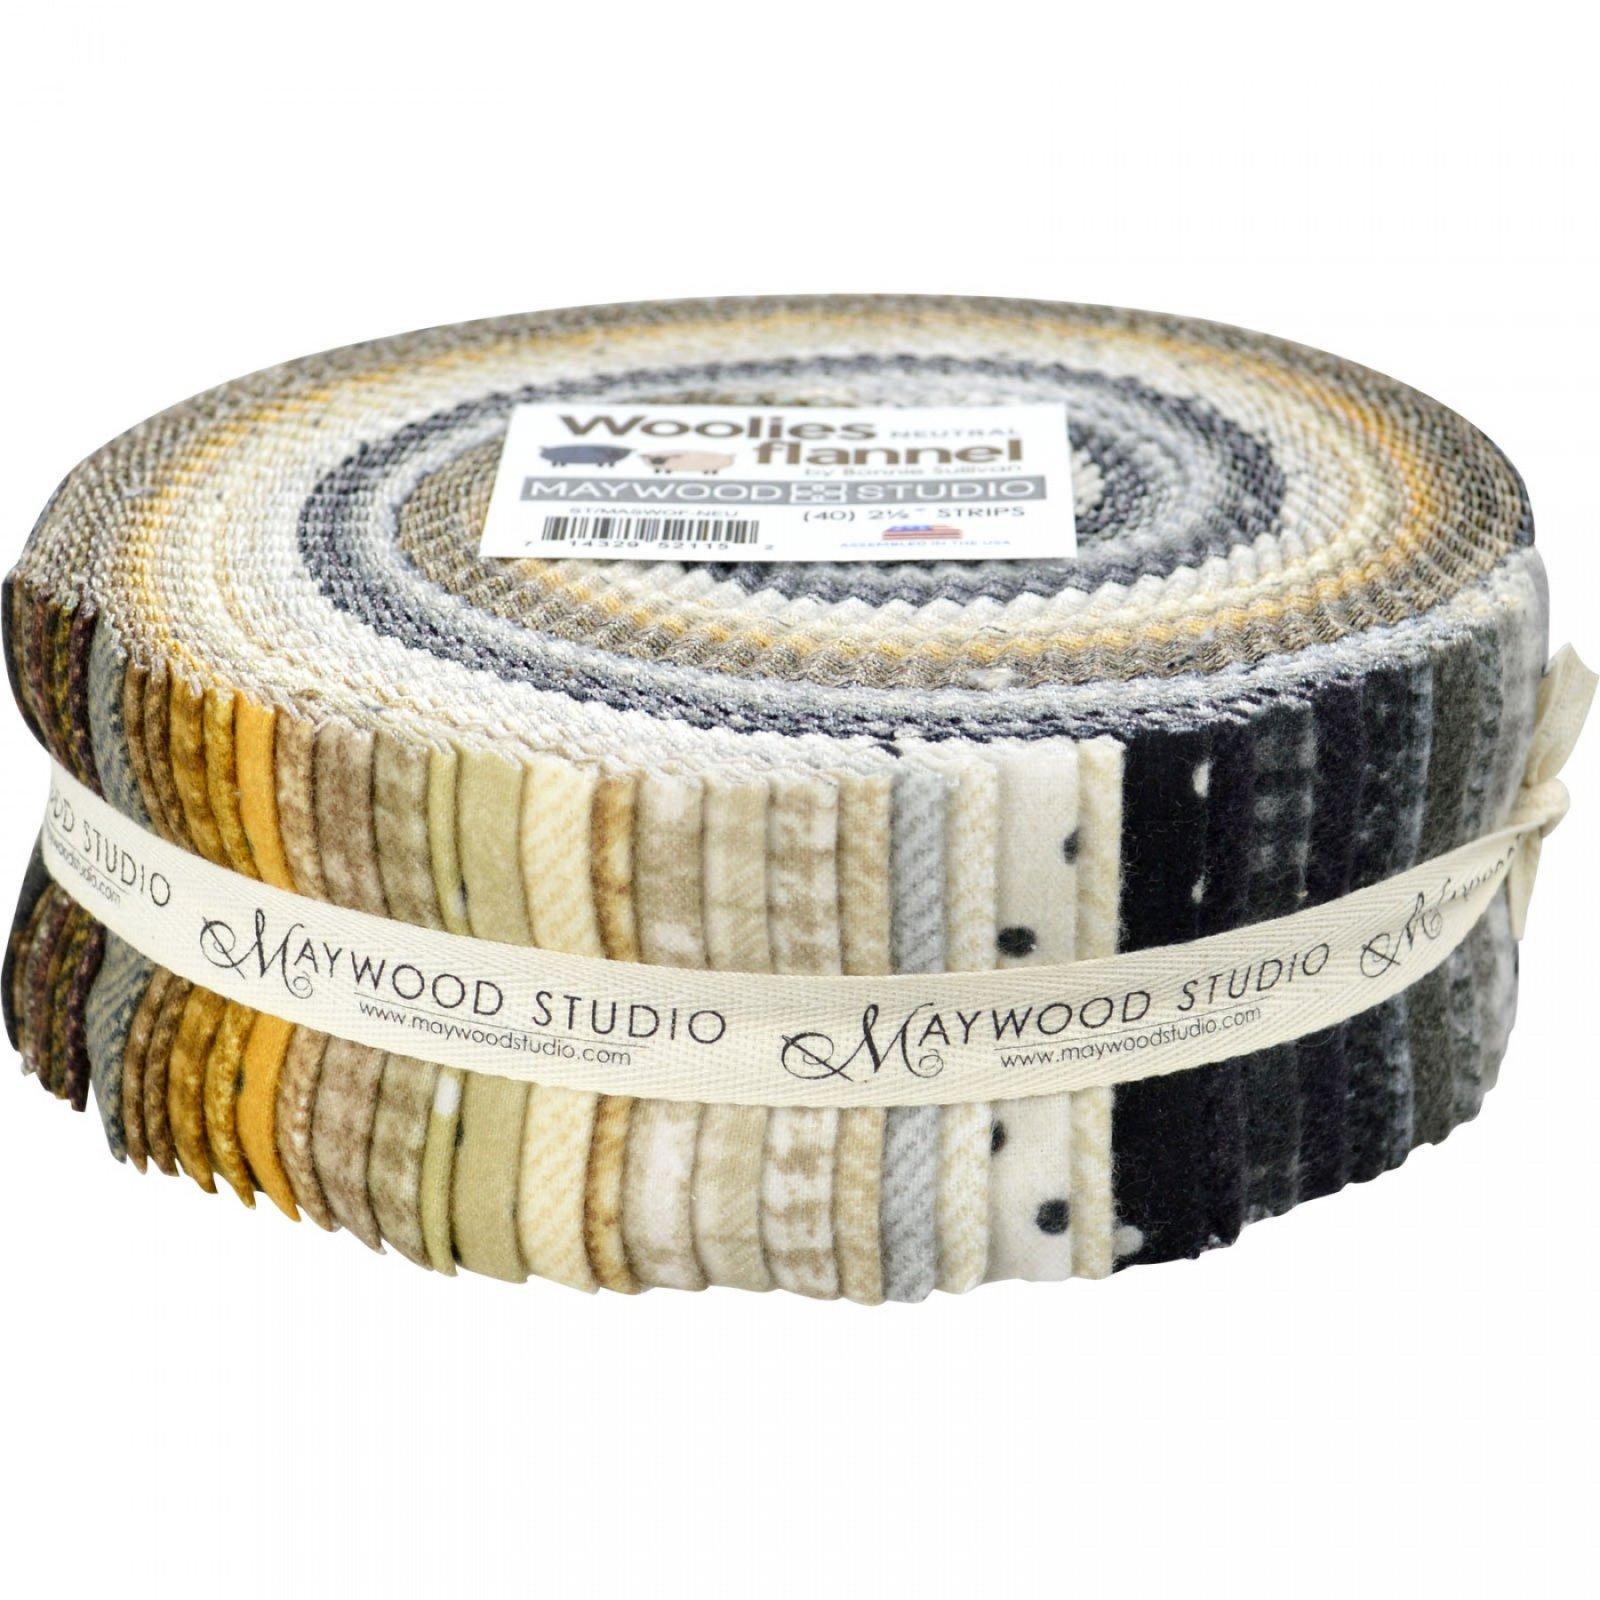 Woolies Flannel 2.5 Strips Neutrals Jelly Roll (40)